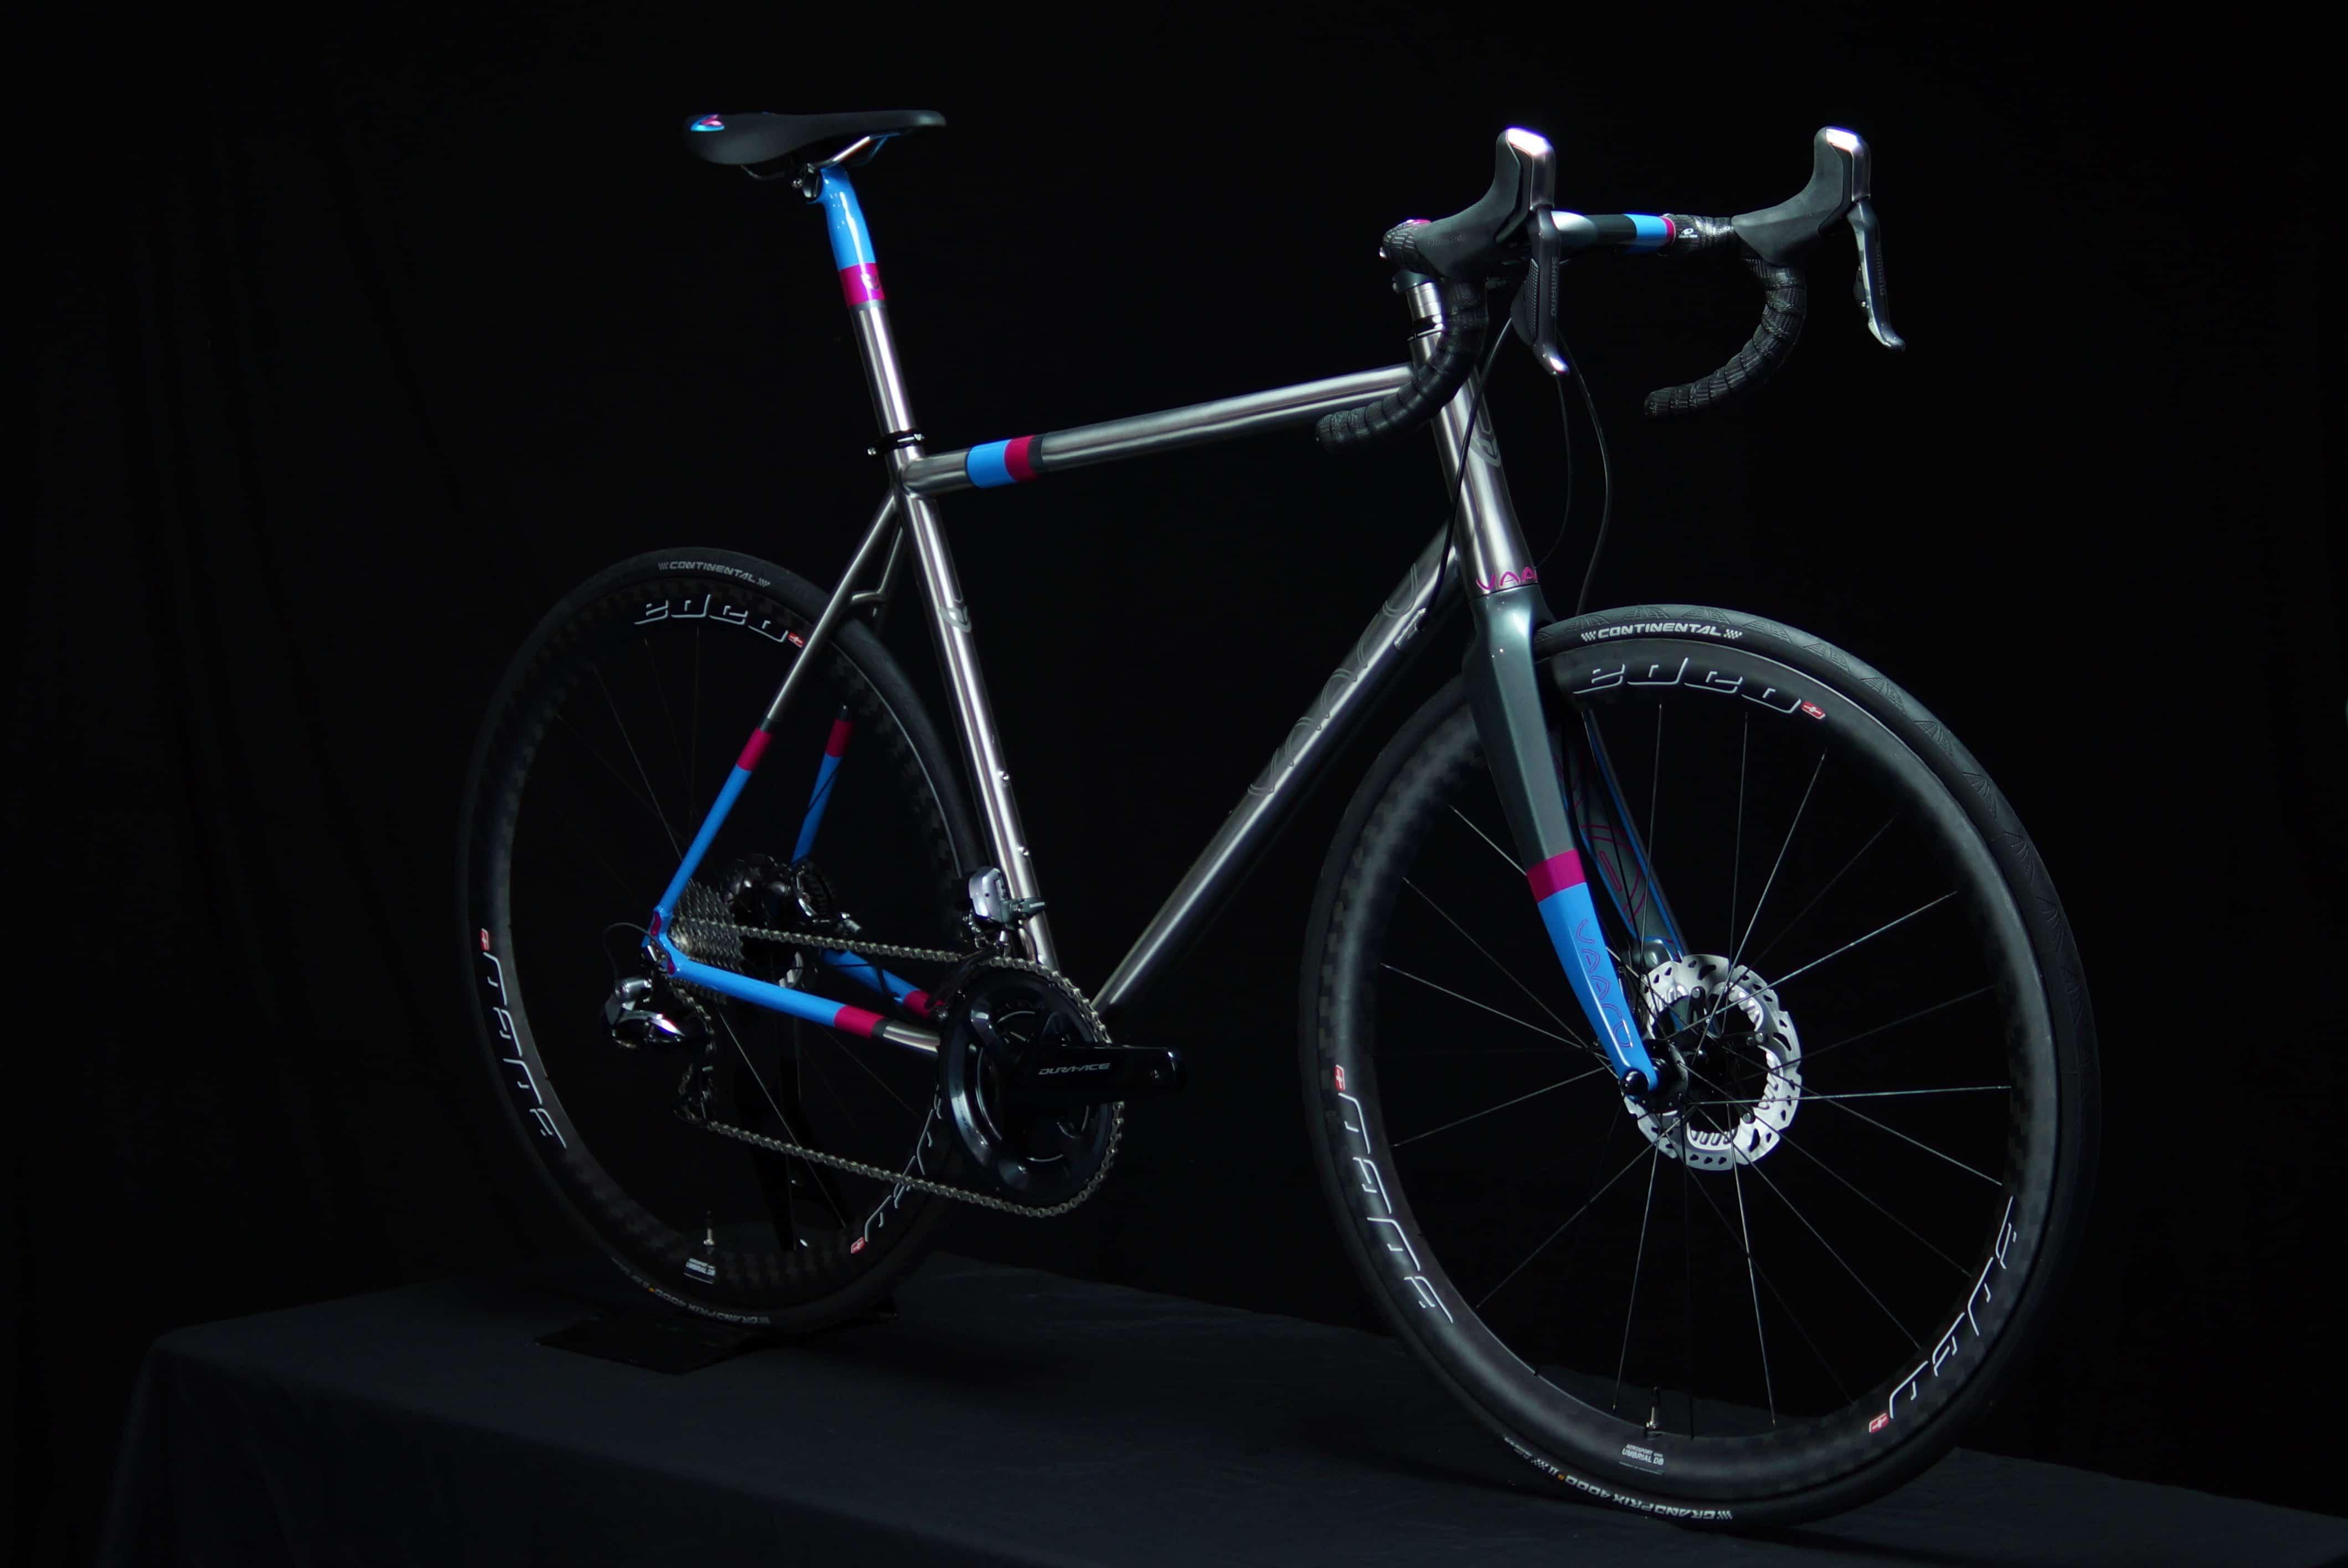 Custom painted V:8 titanium road bike